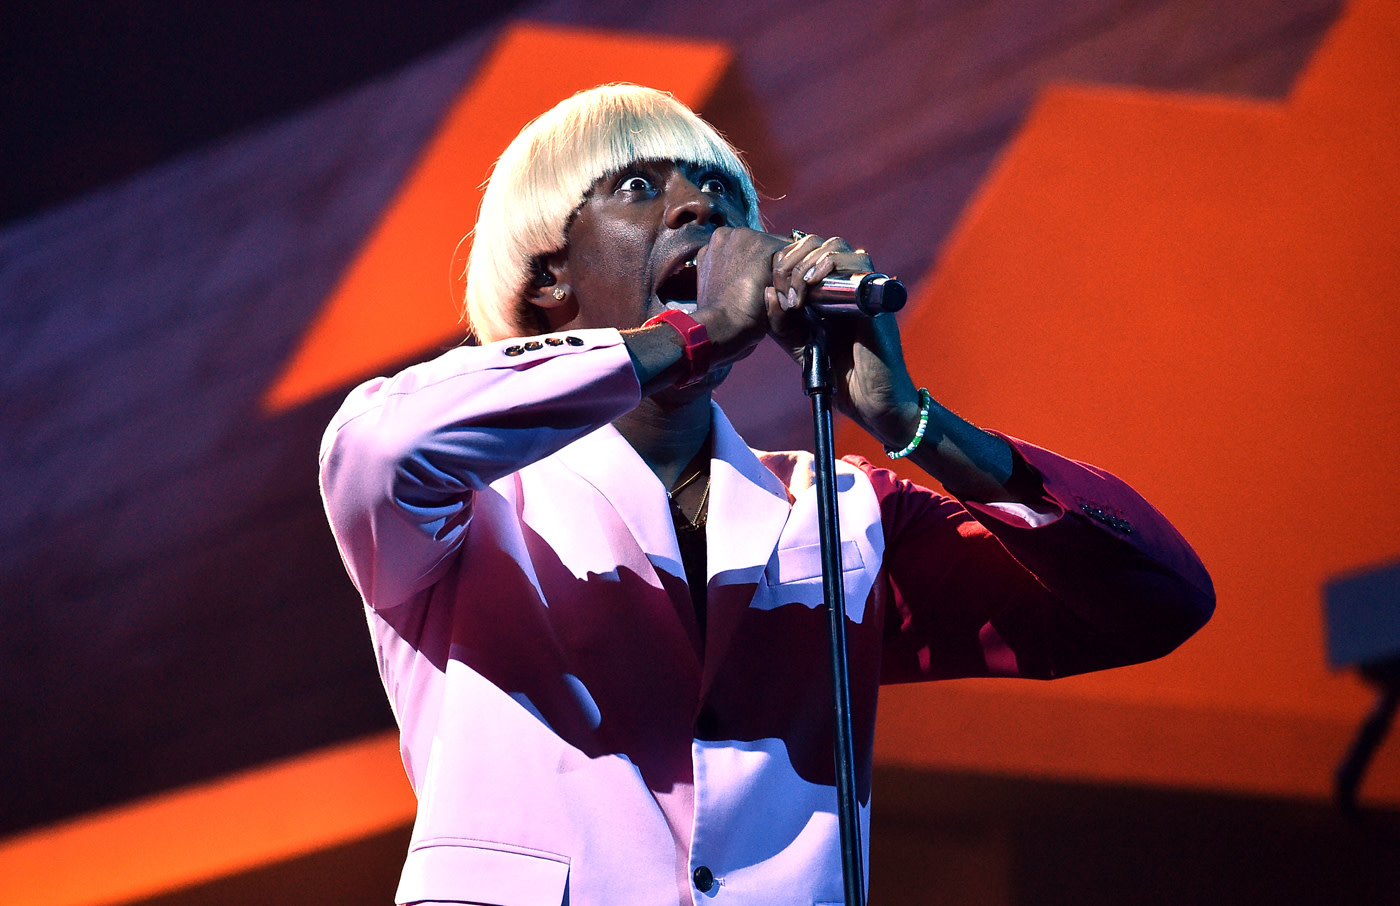 Tyler the Creator 2020 Grammys performance